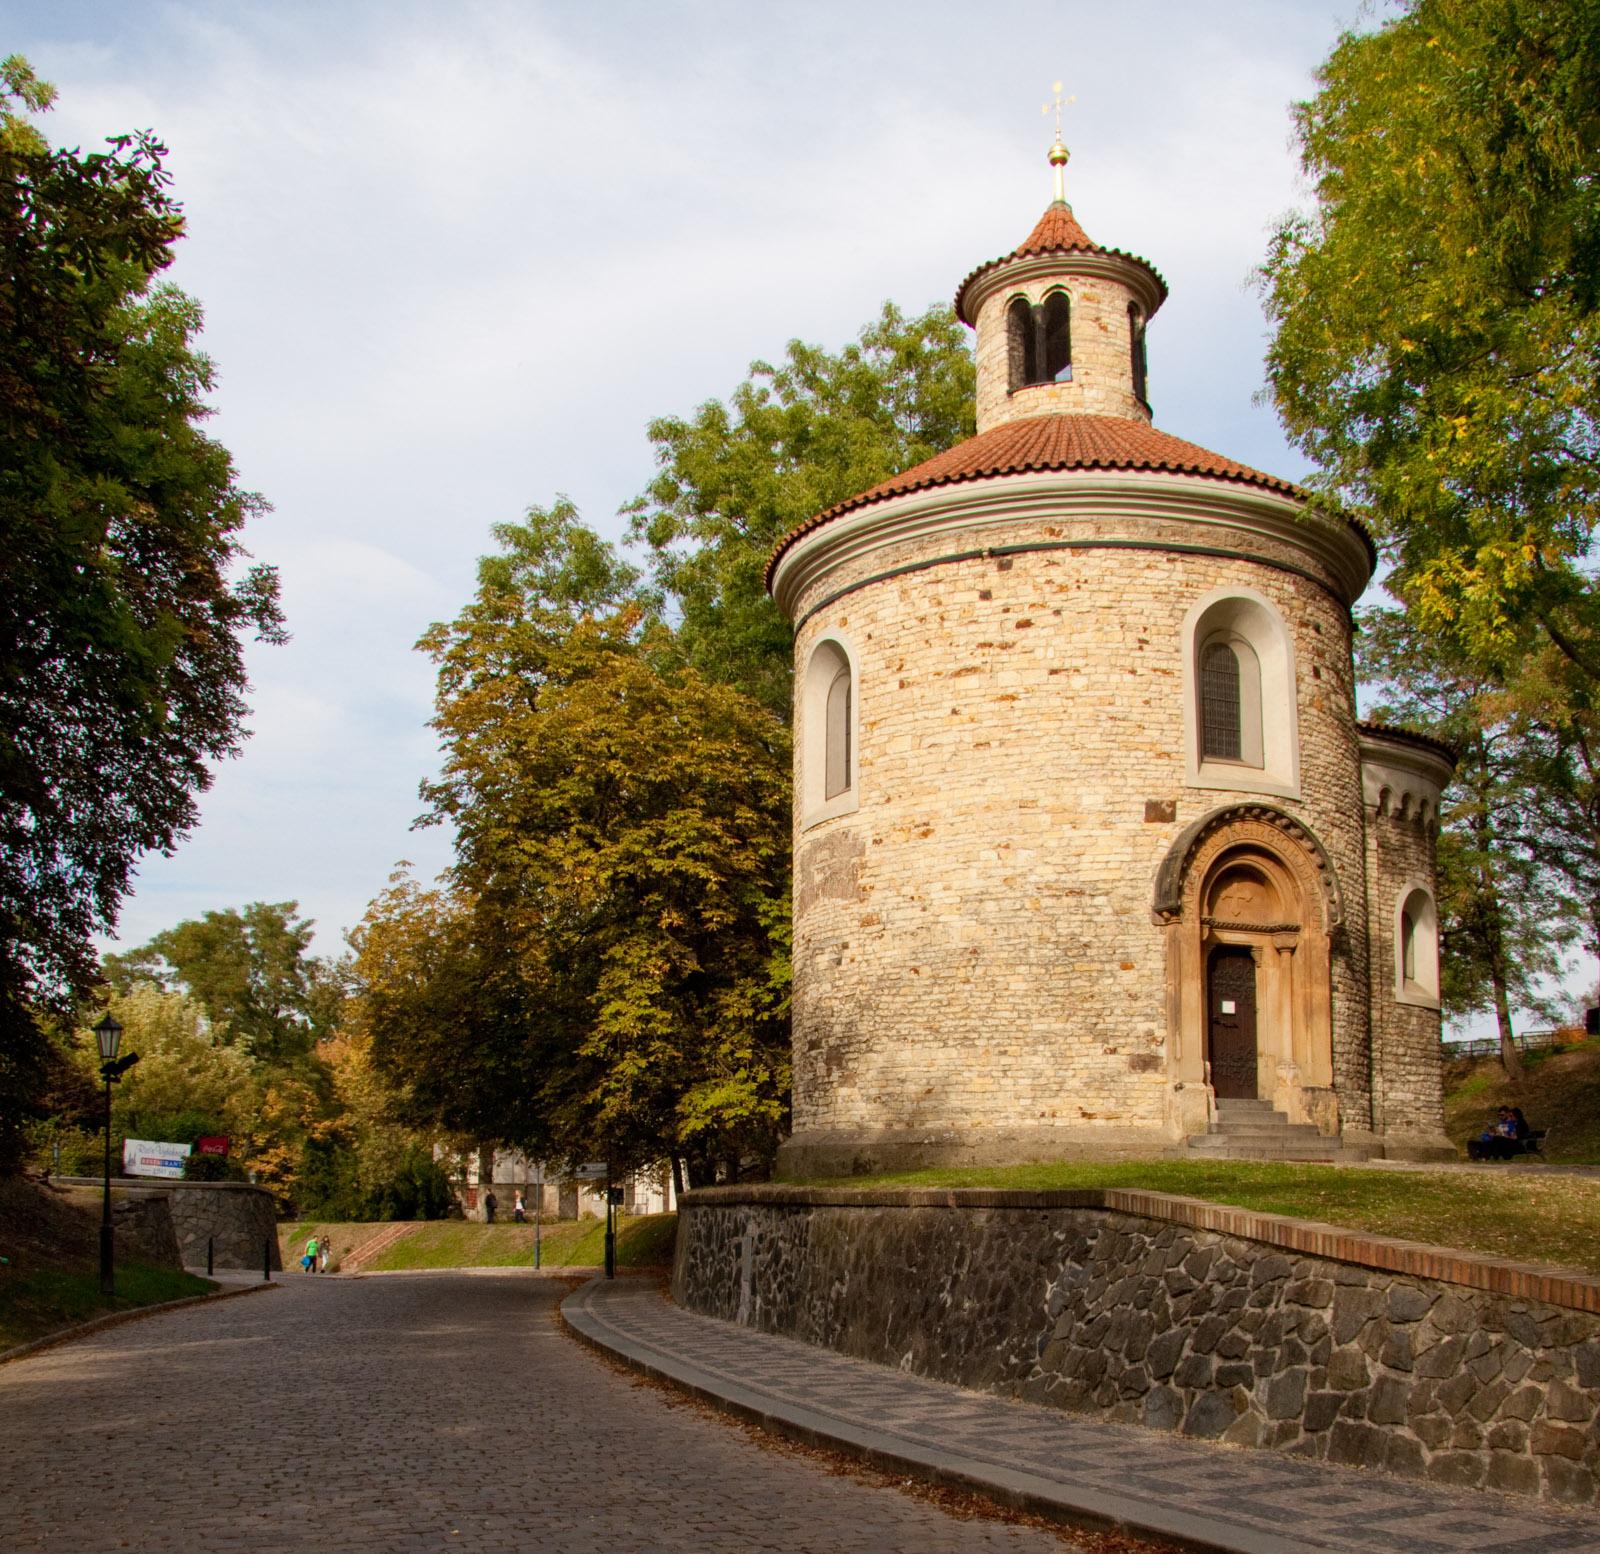 St. Martin's Rotunda